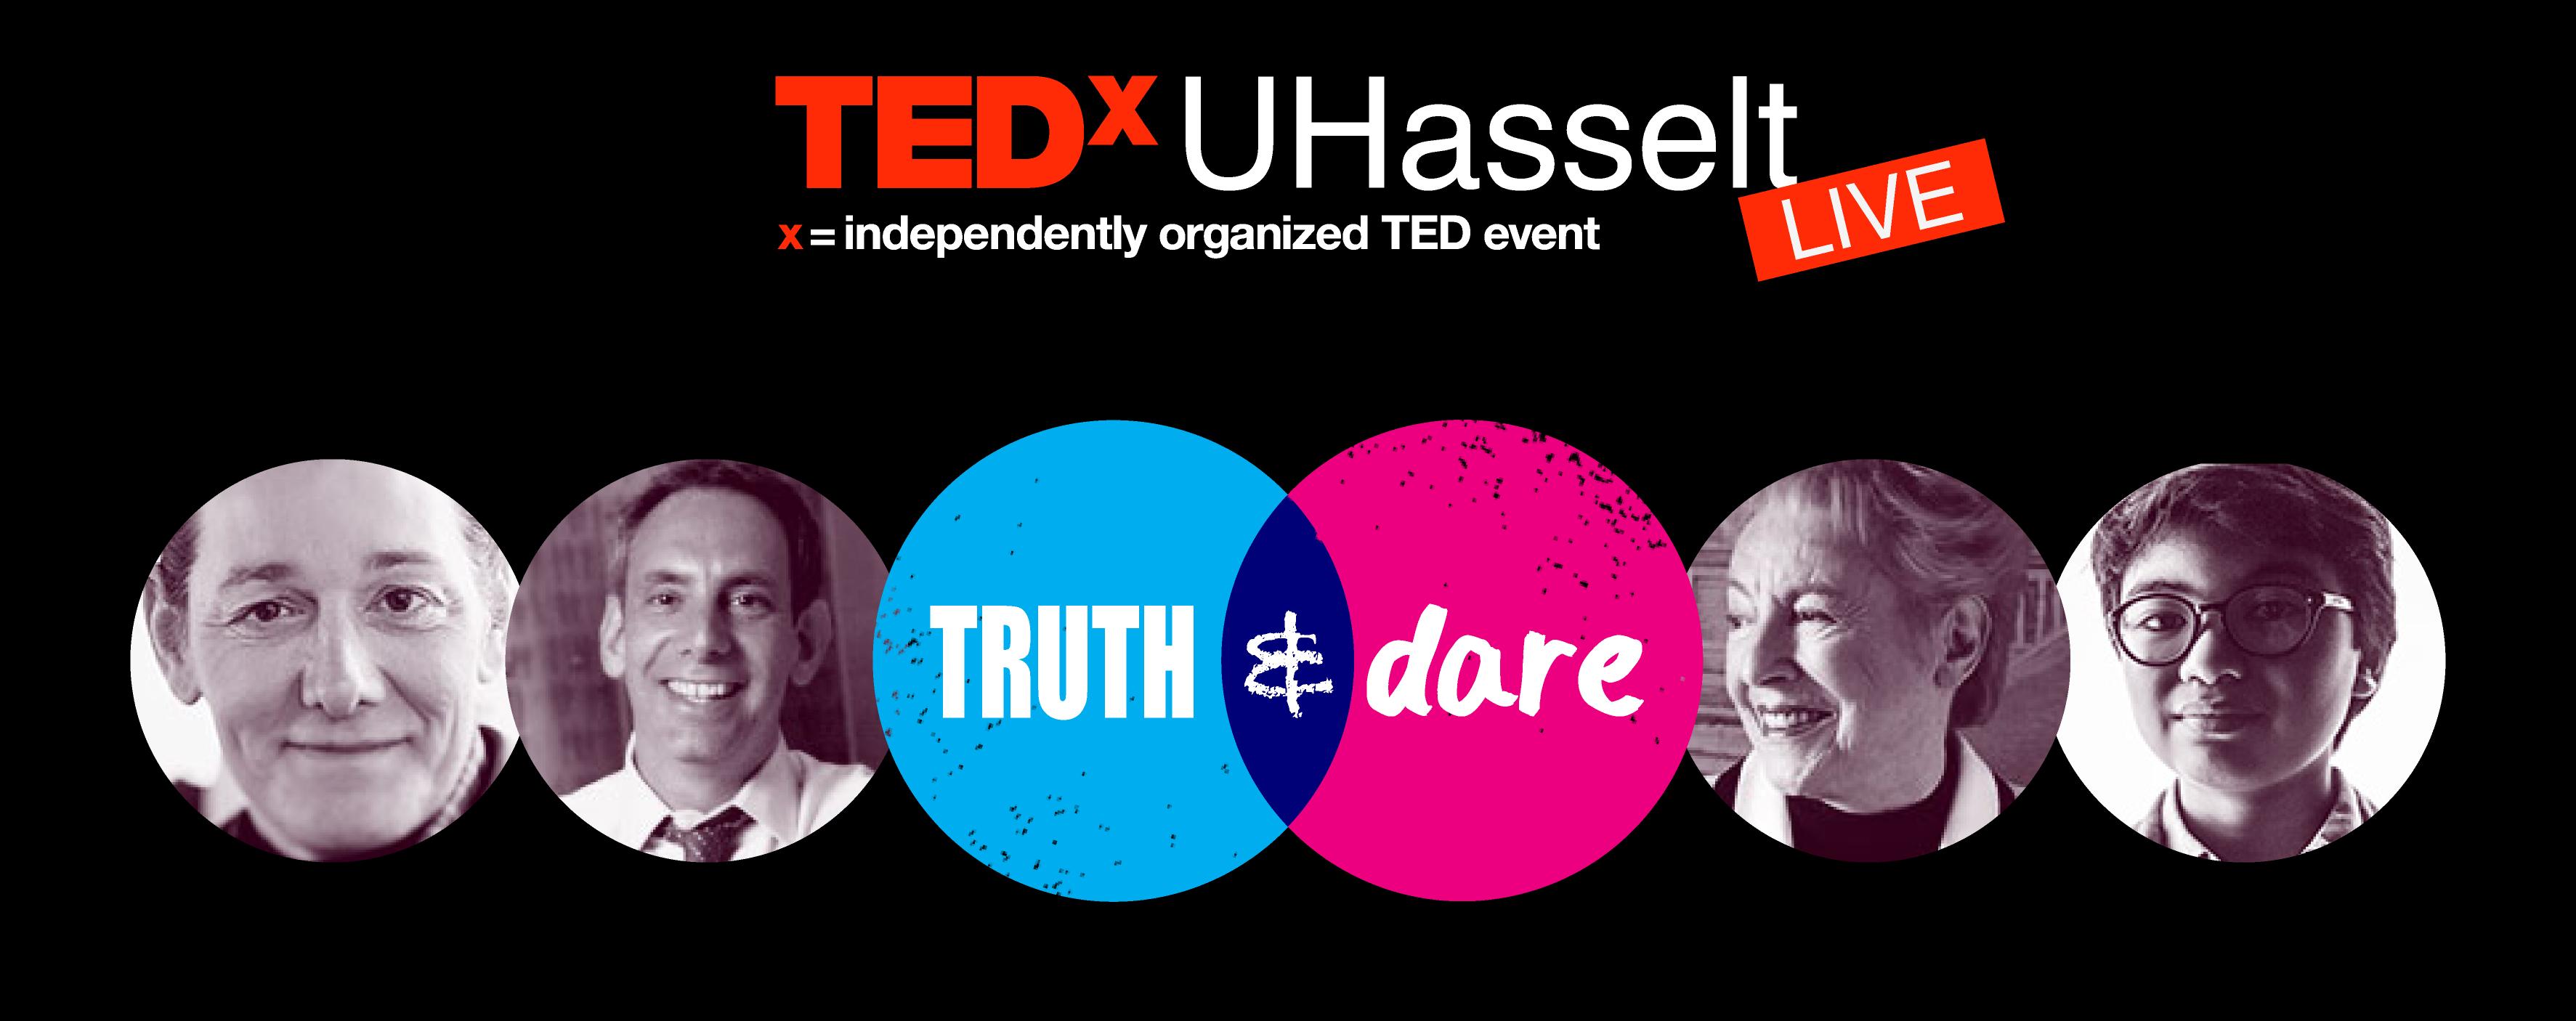 TEDxUHasseltLive Banner